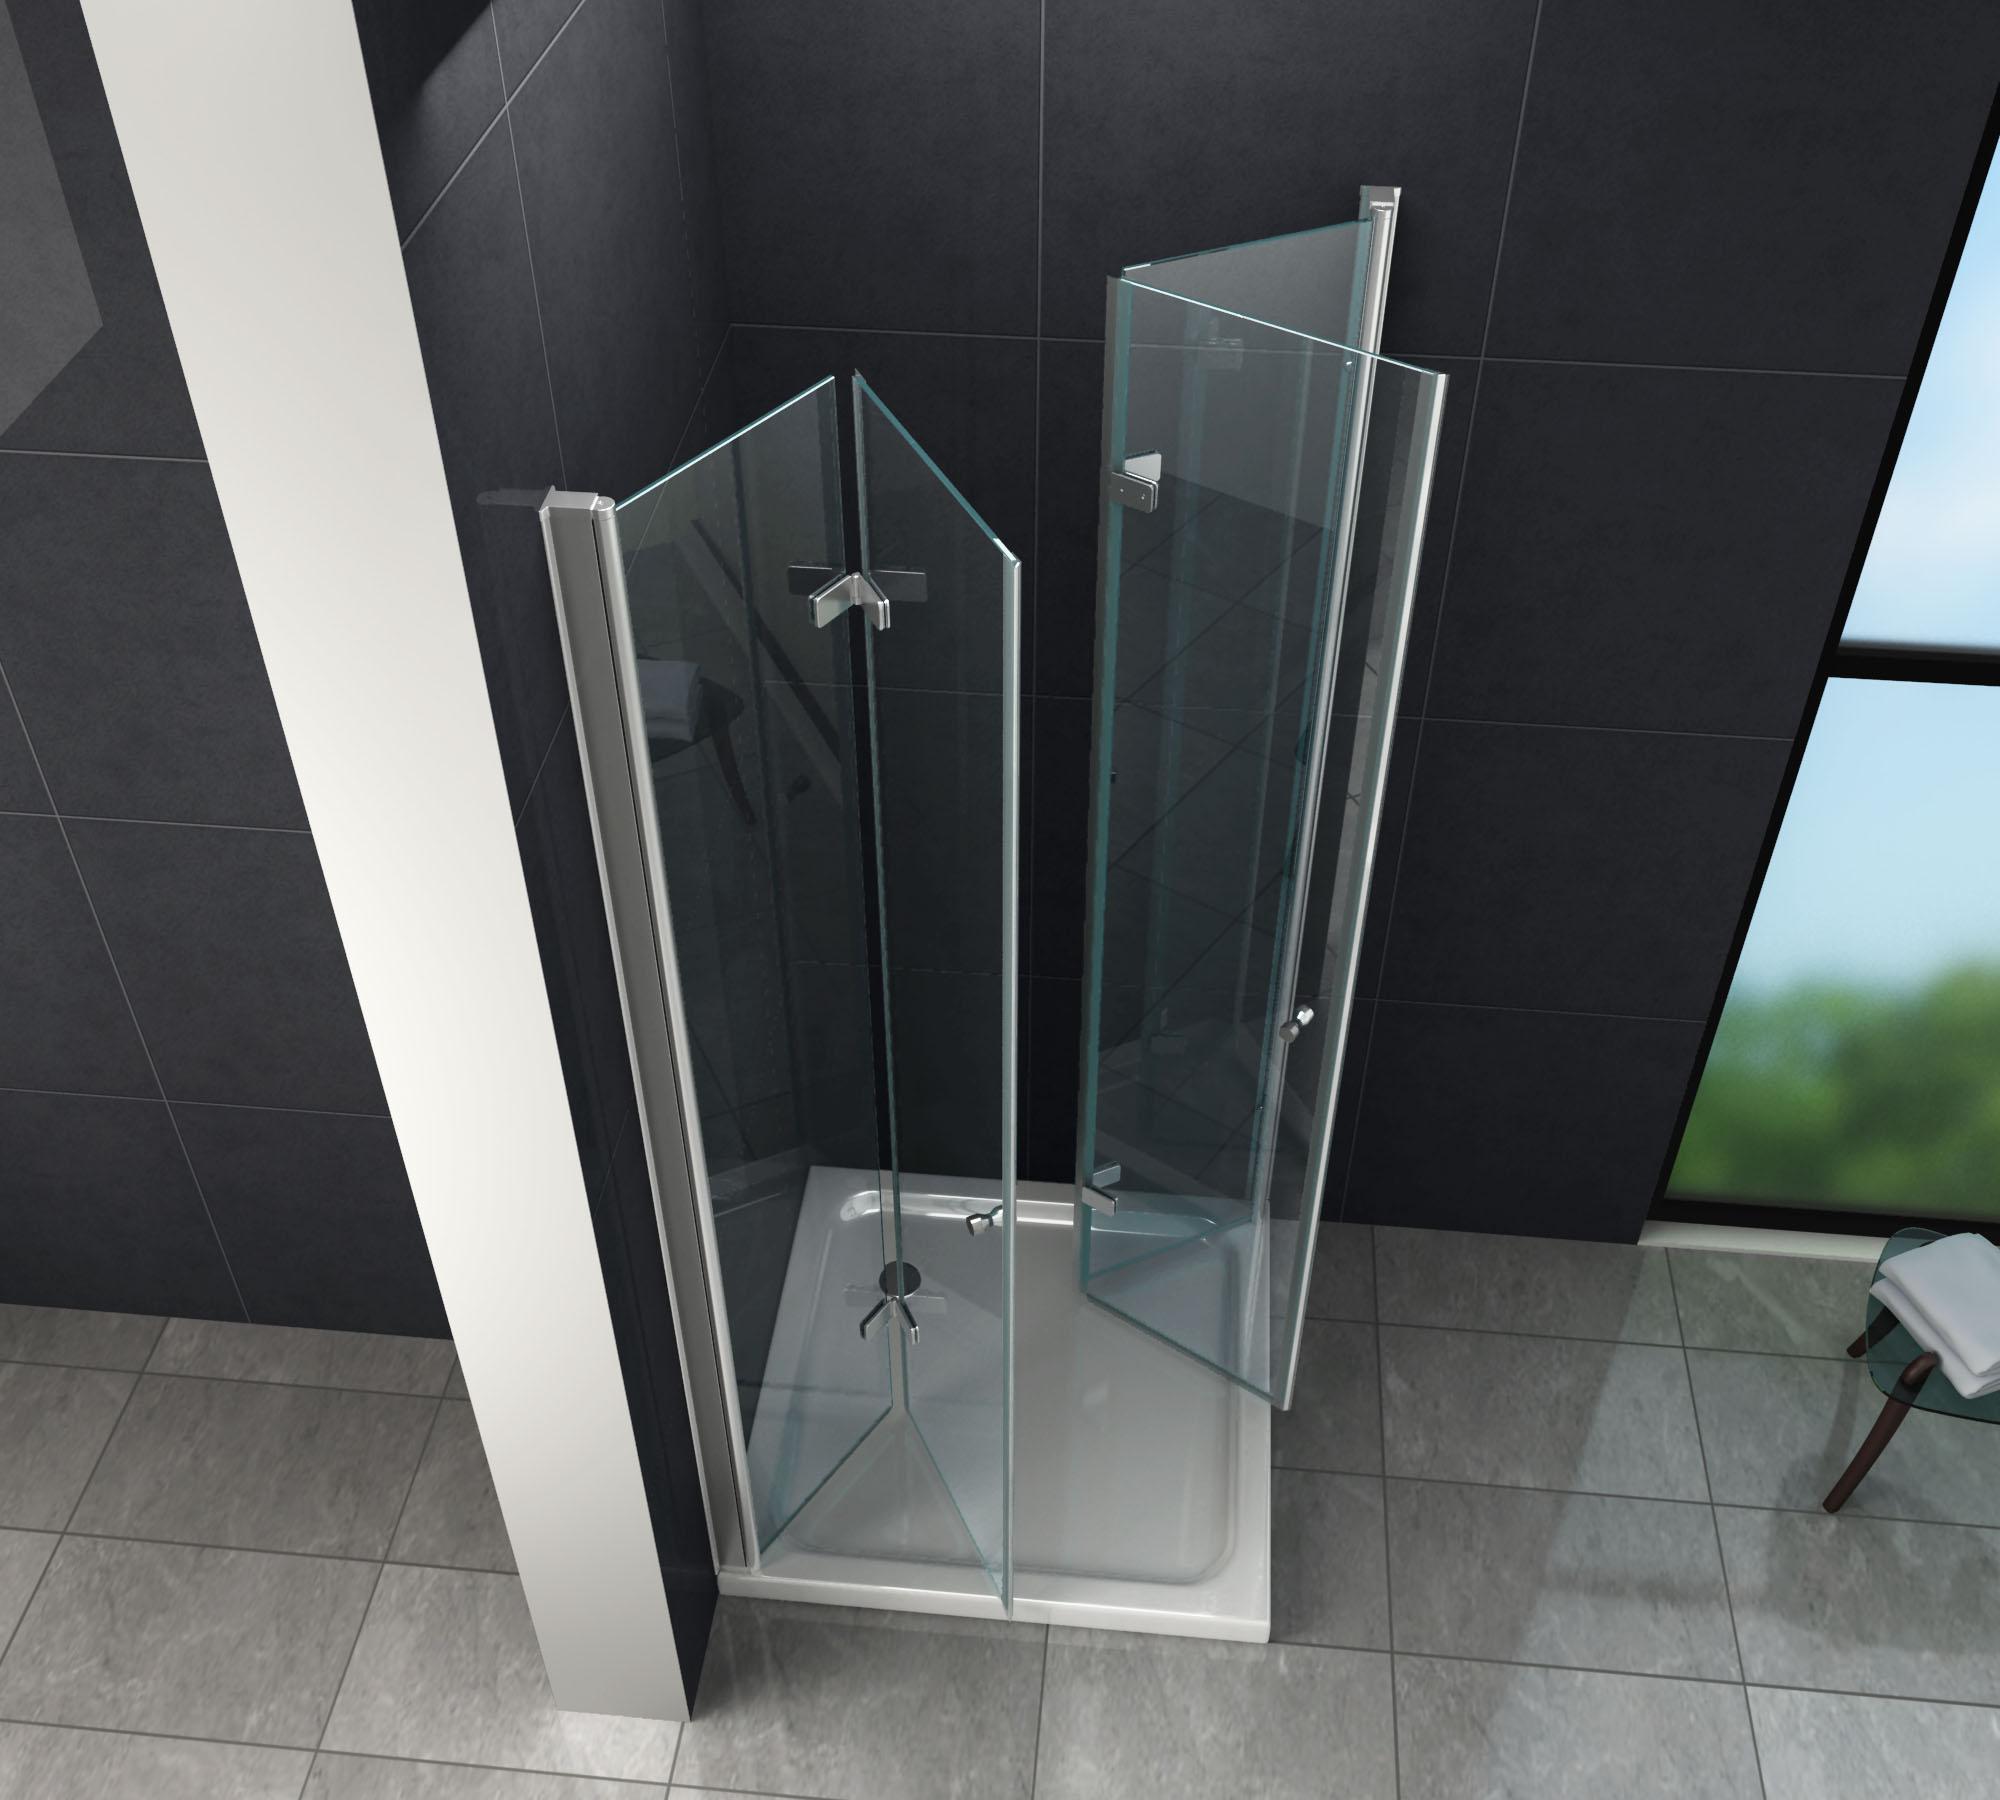 duschkabine clap 90 x 75 x 195 cm ohne duschtasse glasdeals. Black Bedroom Furniture Sets. Home Design Ideas